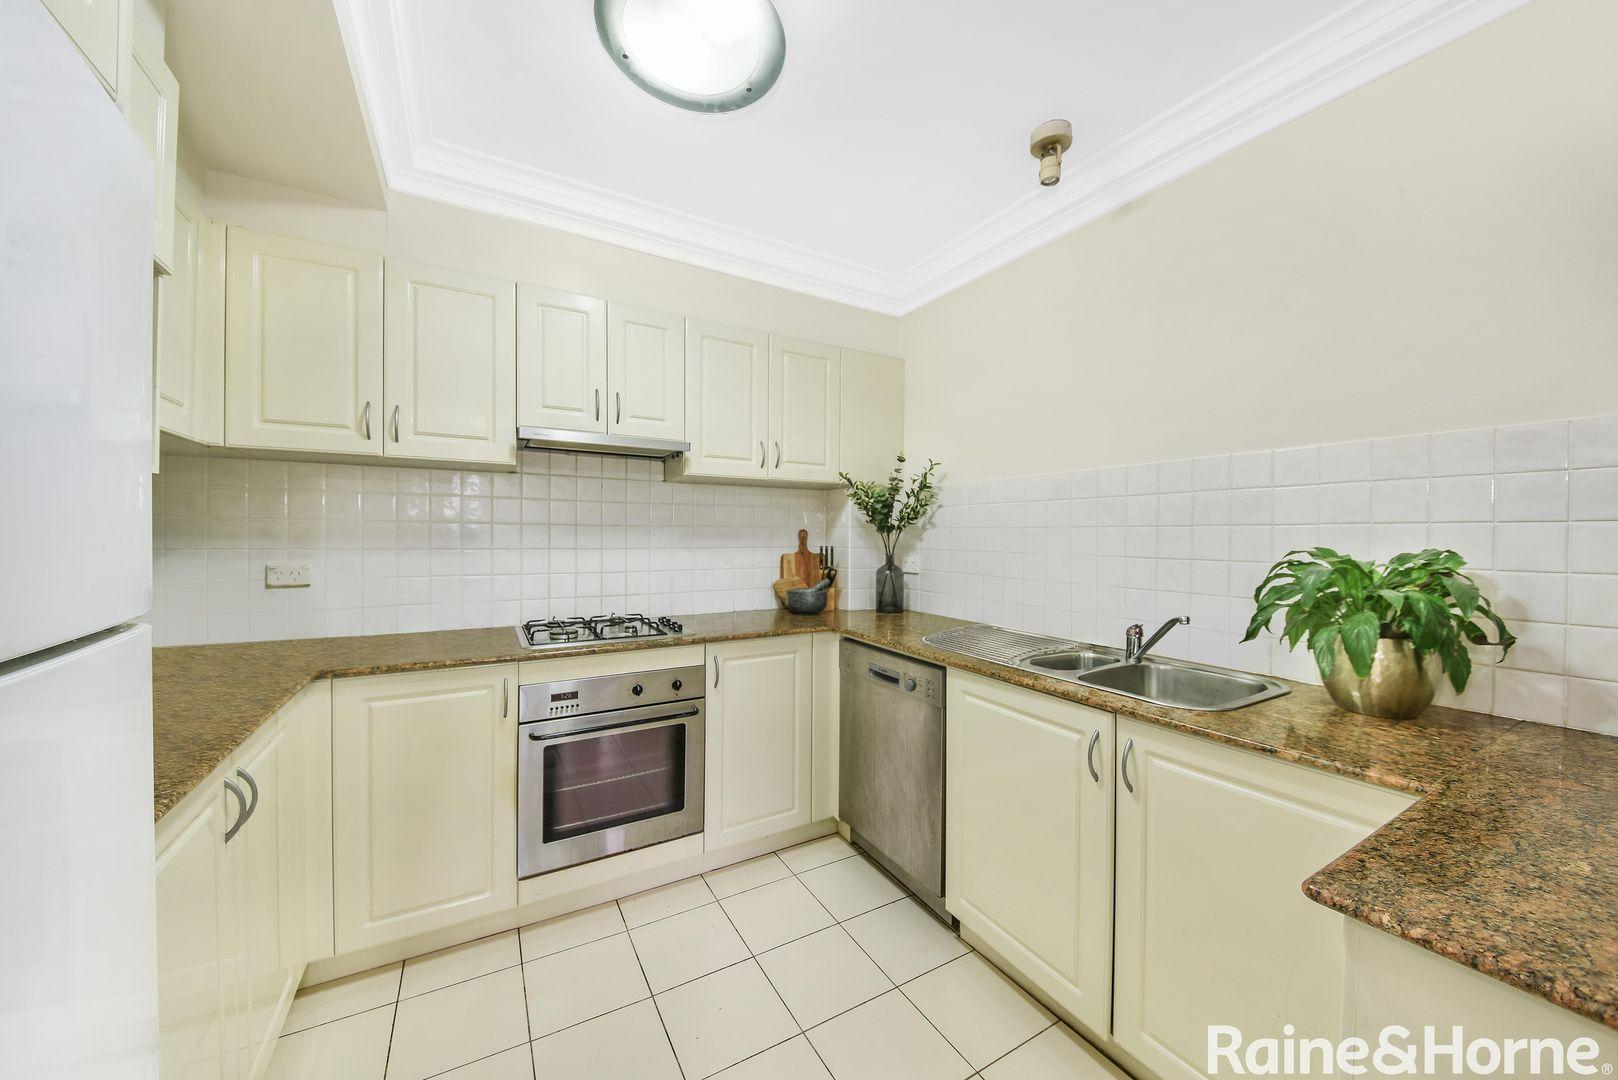 16/92 Parraween Street, Cremorne NSW 2090, Image 1